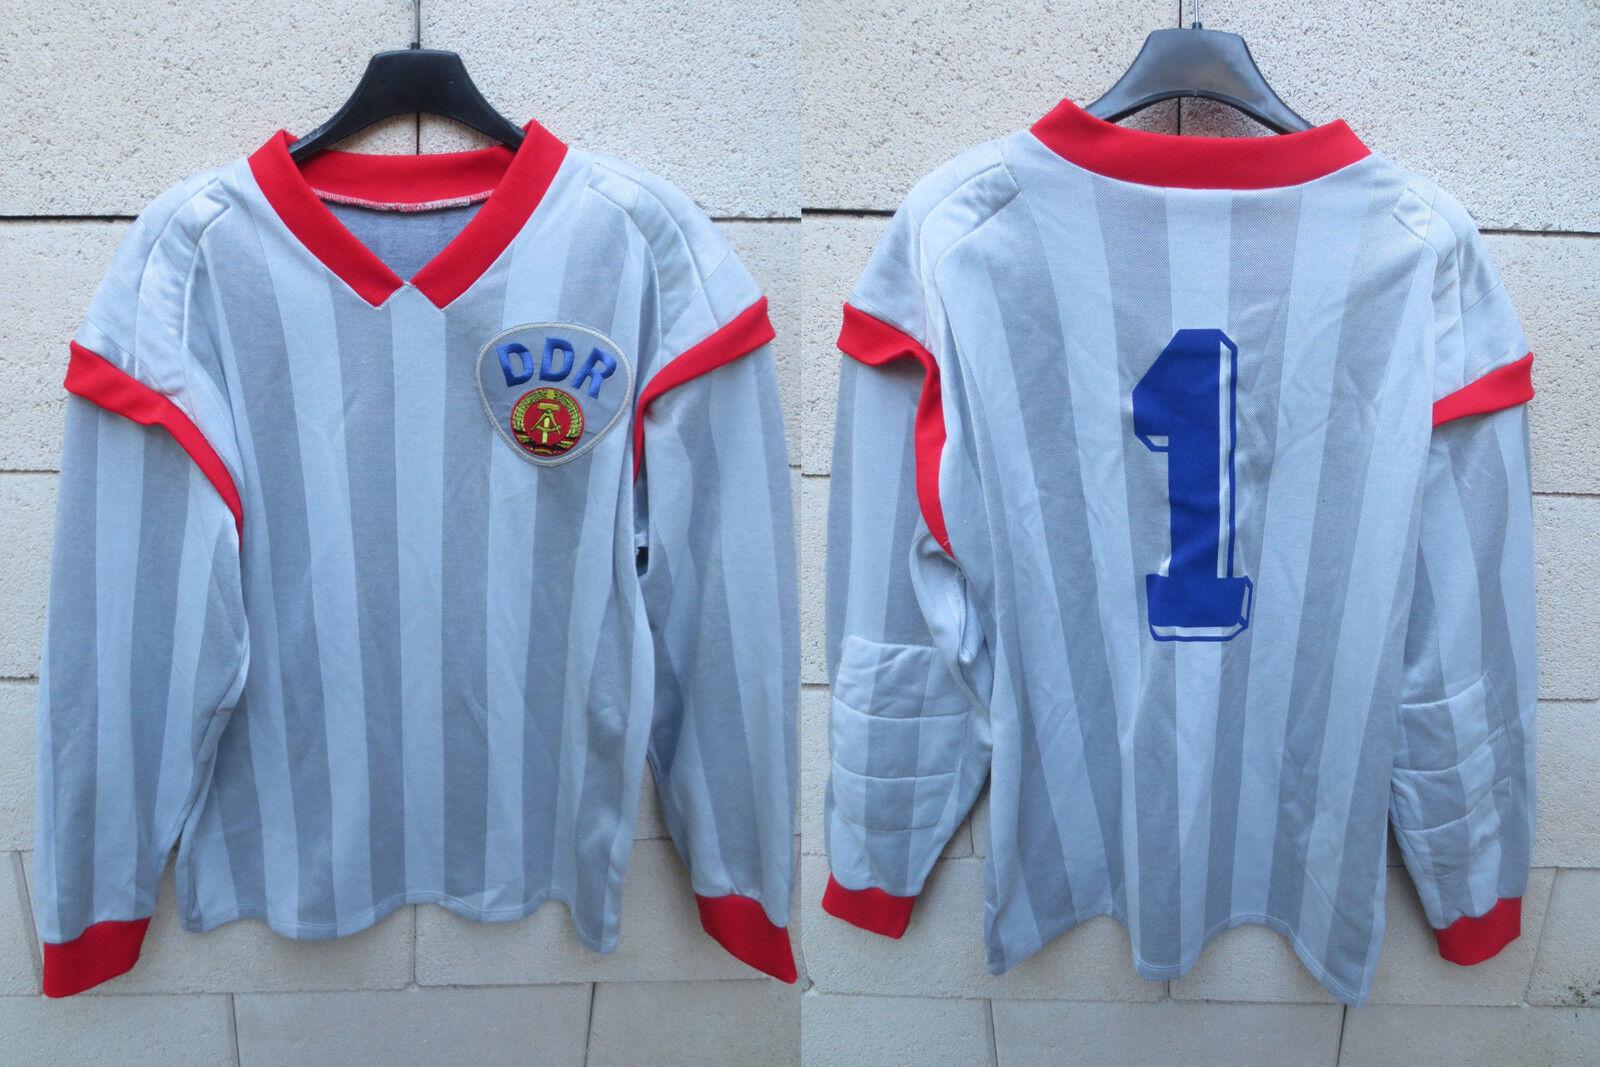 VINTAGE Maillot RDA DDR goal n°1 trikot oldschool shirt football années 80 M